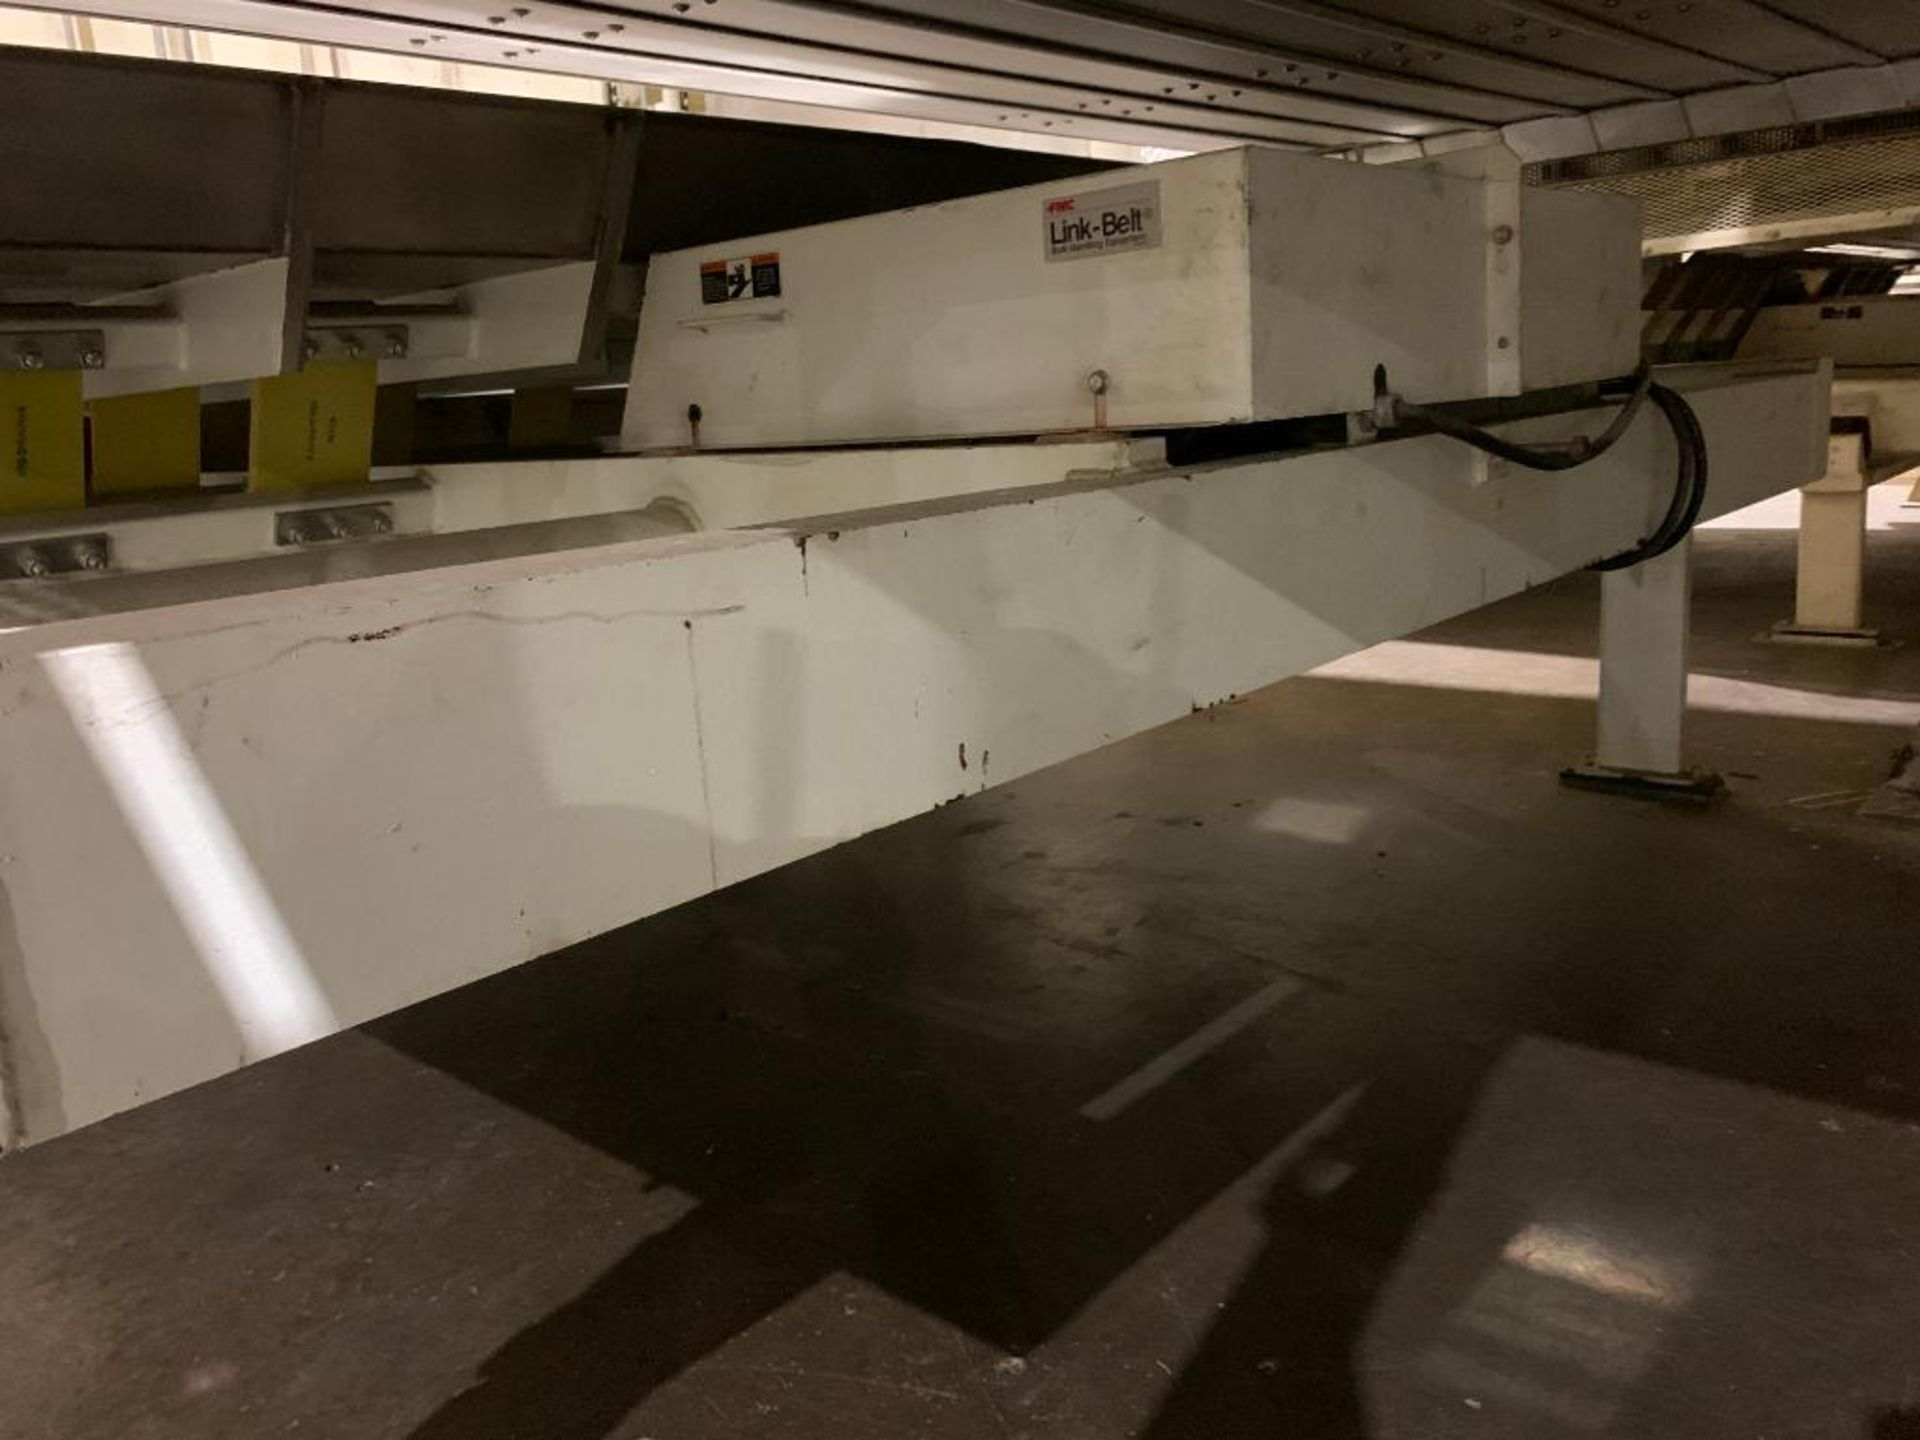 Link-Belt vibratory conveyor - Image 11 of 13